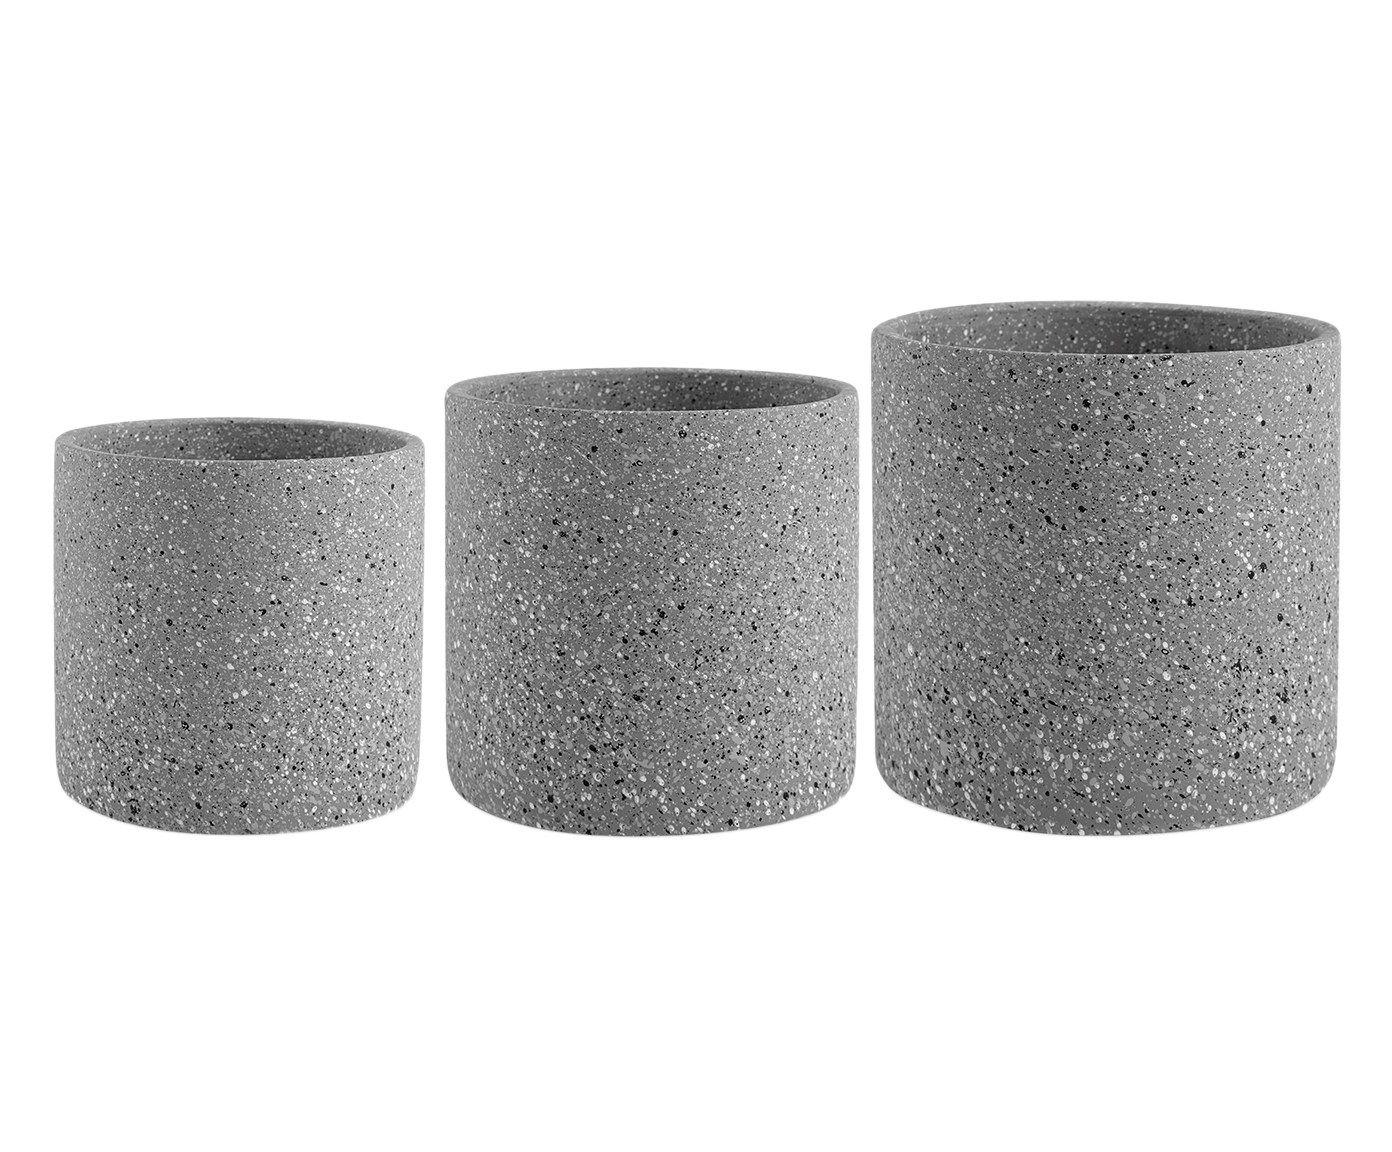 Jogo de Cachepots Stone Cinza Escuro | Westwing.com.br